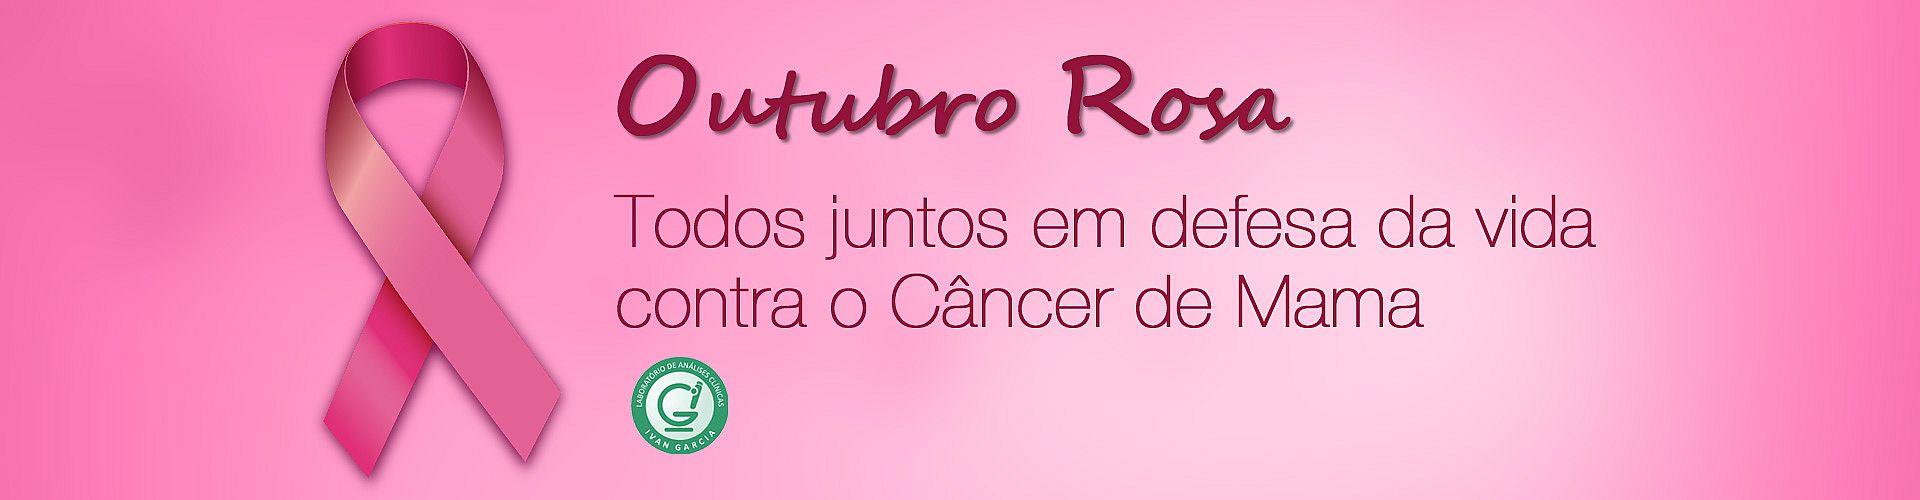 Outubro Rosa 2020 - Laboratório Ivan Garcia